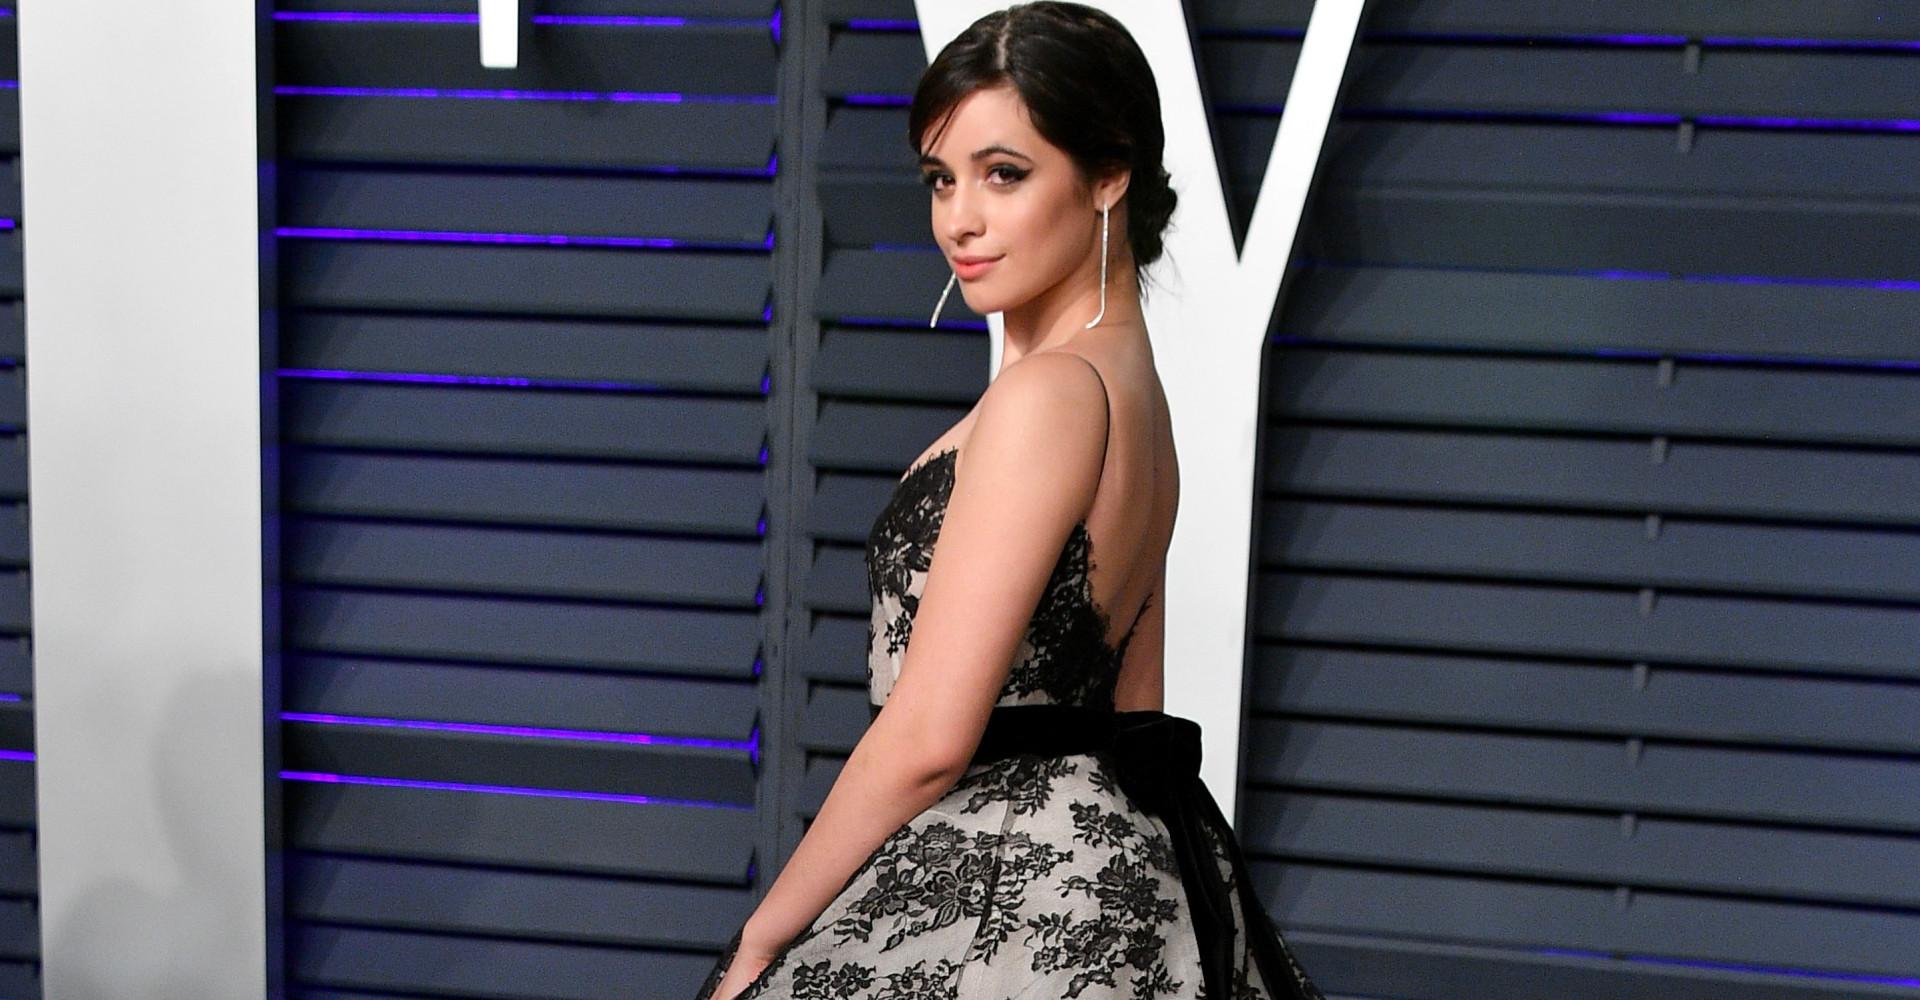 Camila Cabello vai estrear como atriz no papel de Cinderela